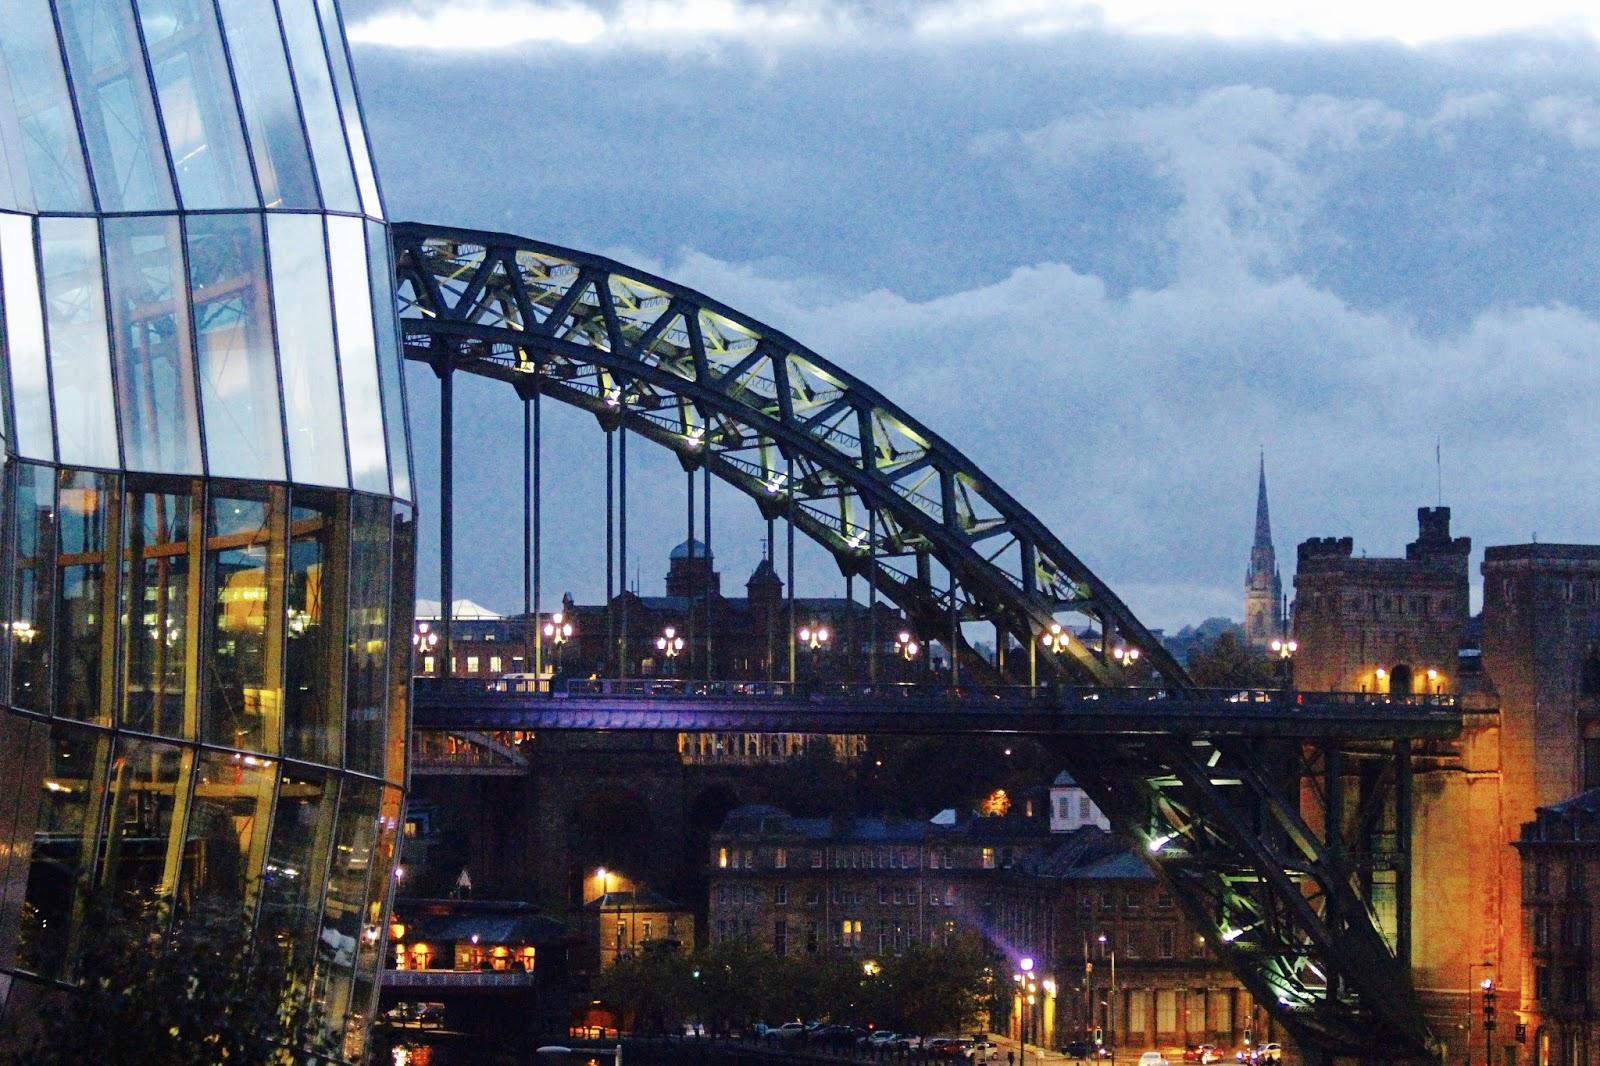 the sage gateshead tyne bridge